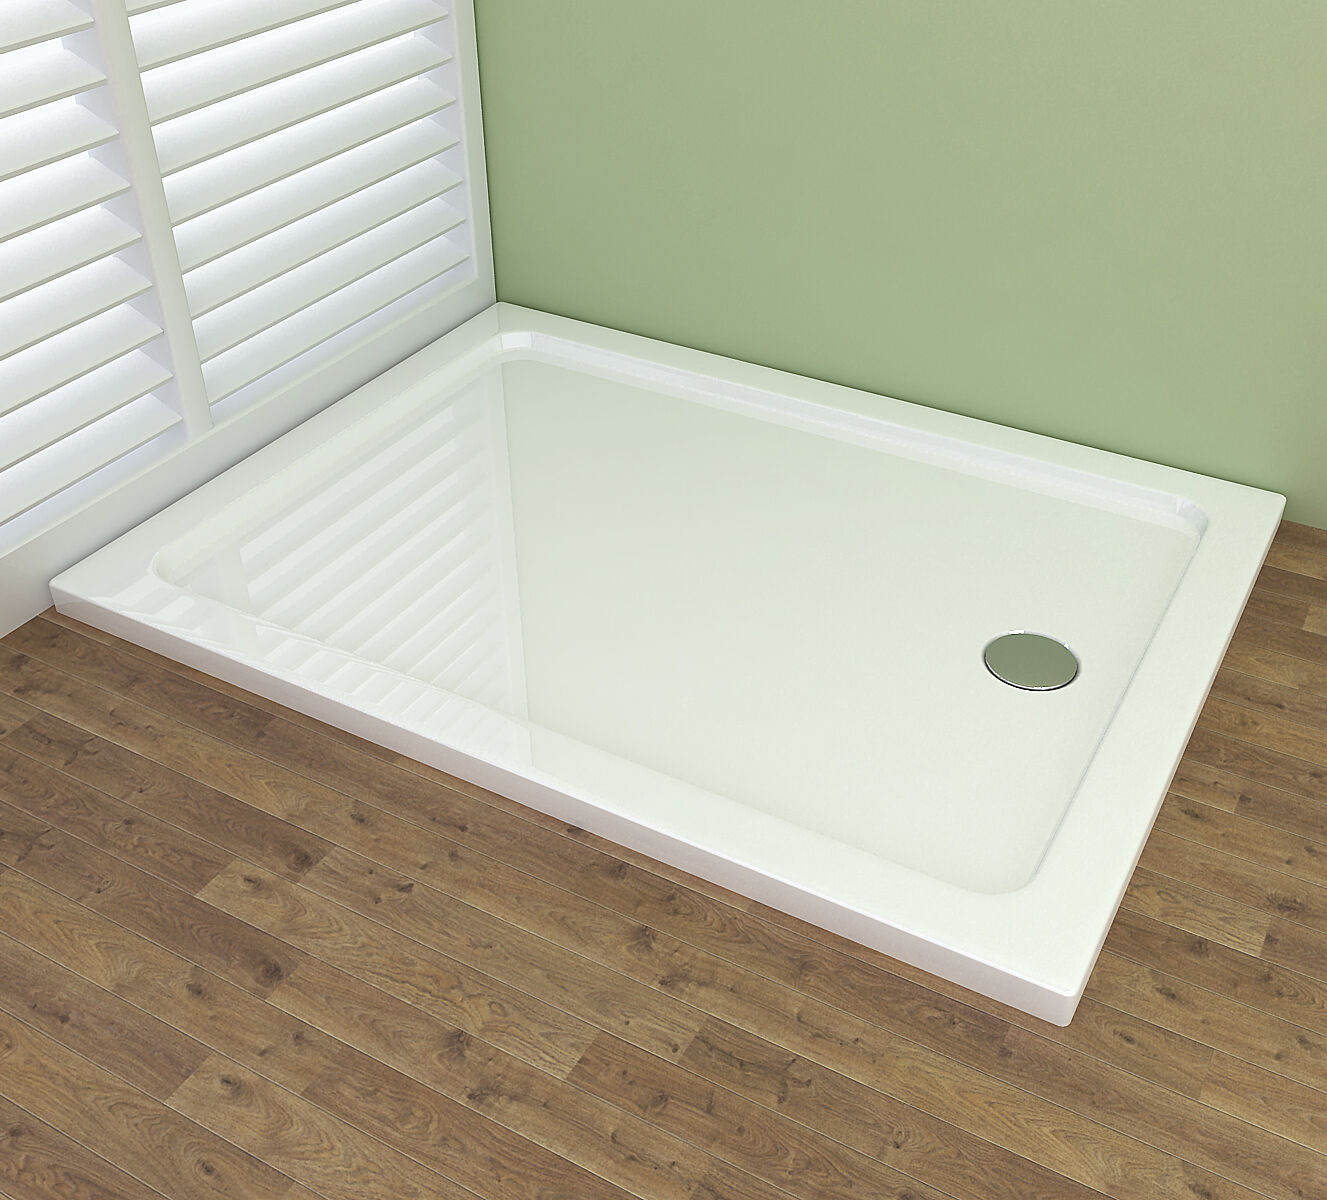 duschwanne acryl duschtasse dusche acrylwanne 40mm flach. Black Bedroom Furniture Sets. Home Design Ideas